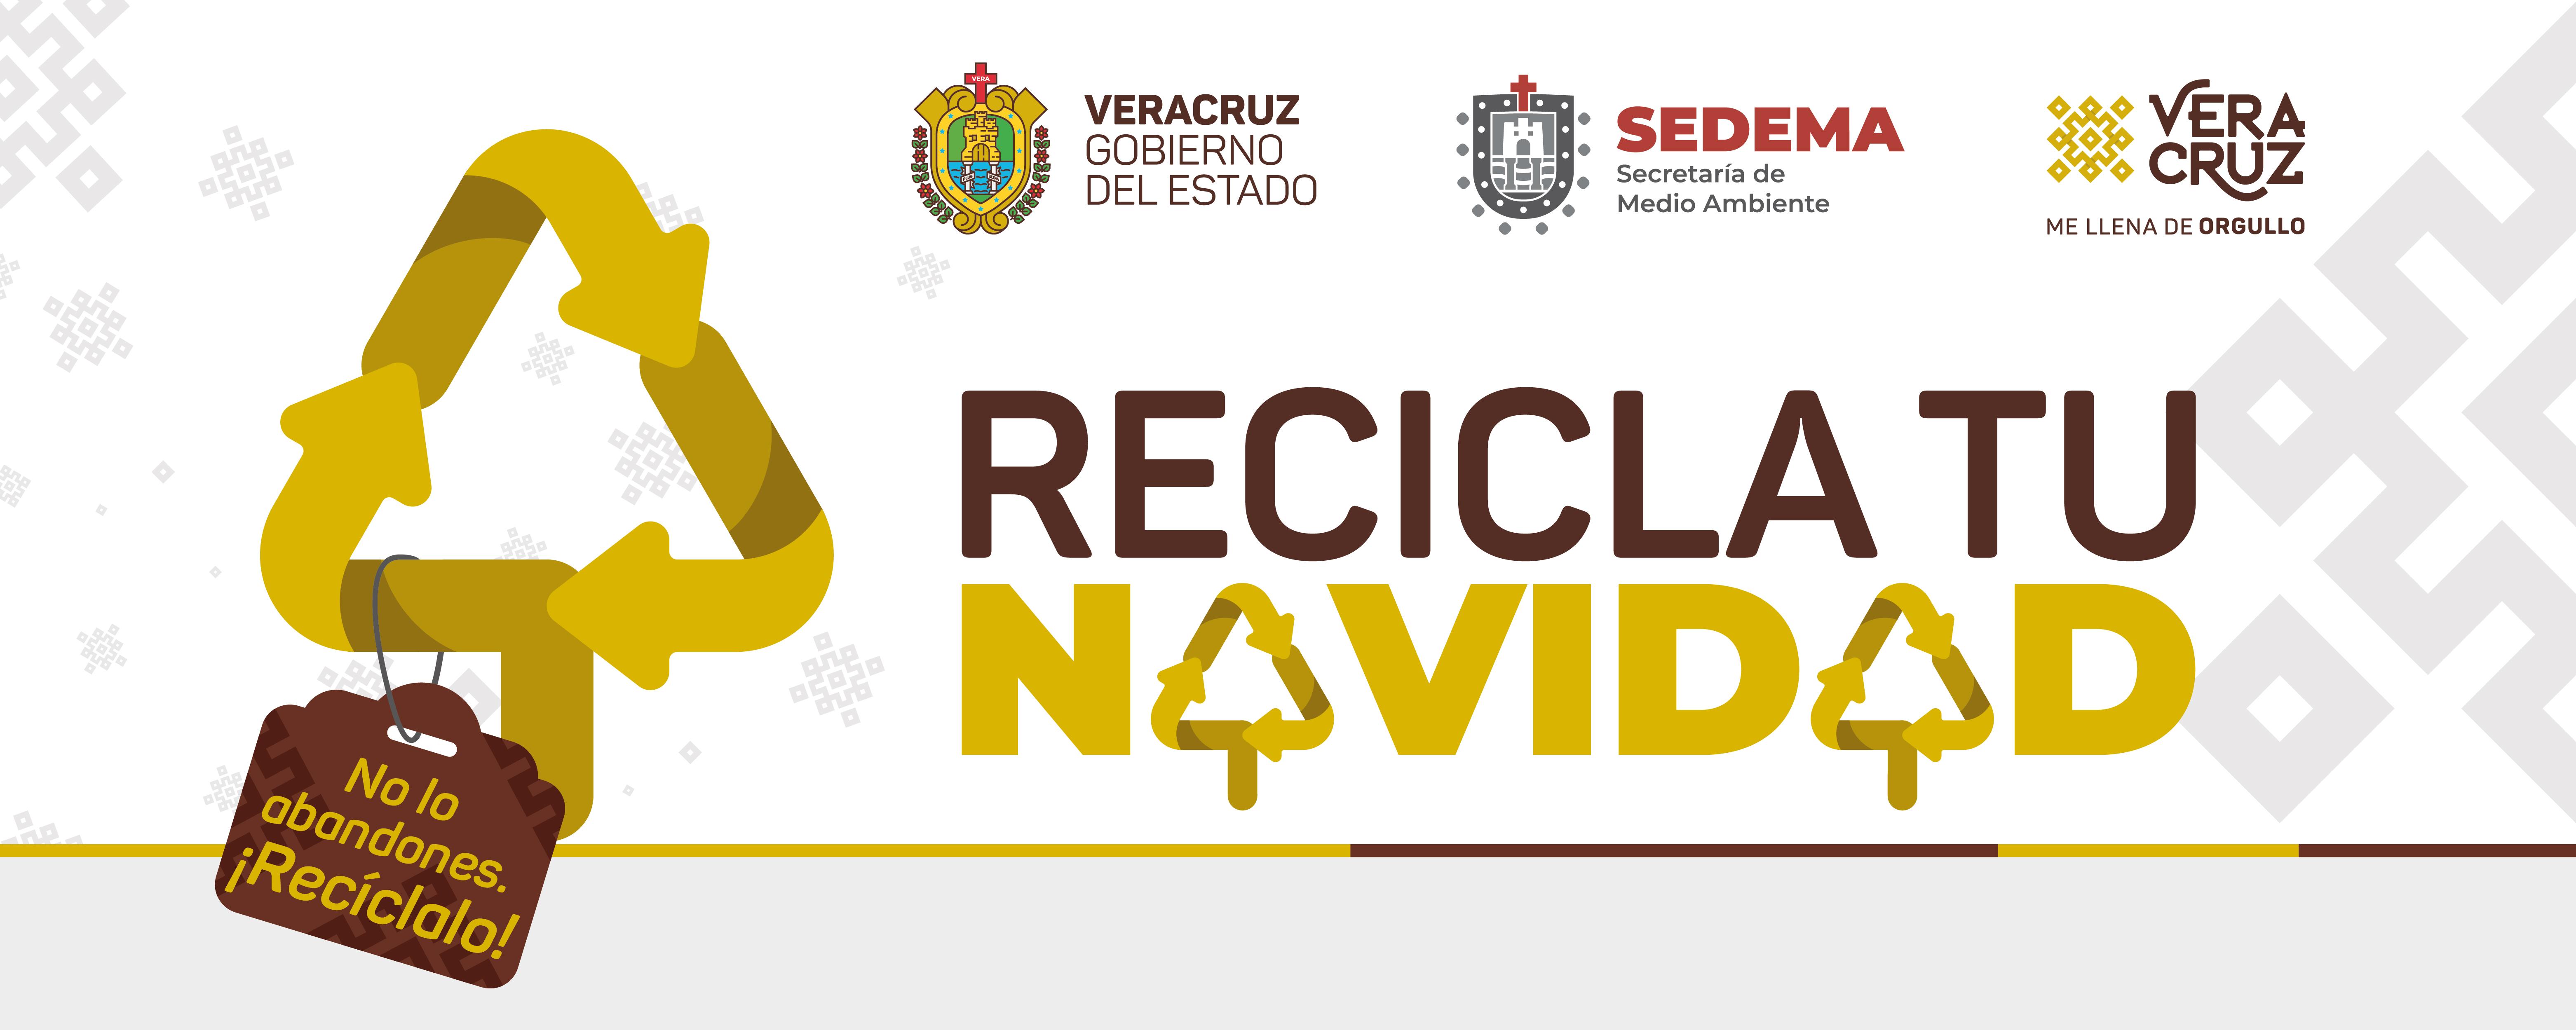 Calendario De Verificacion Fisico Mecanica 2019.Sedema